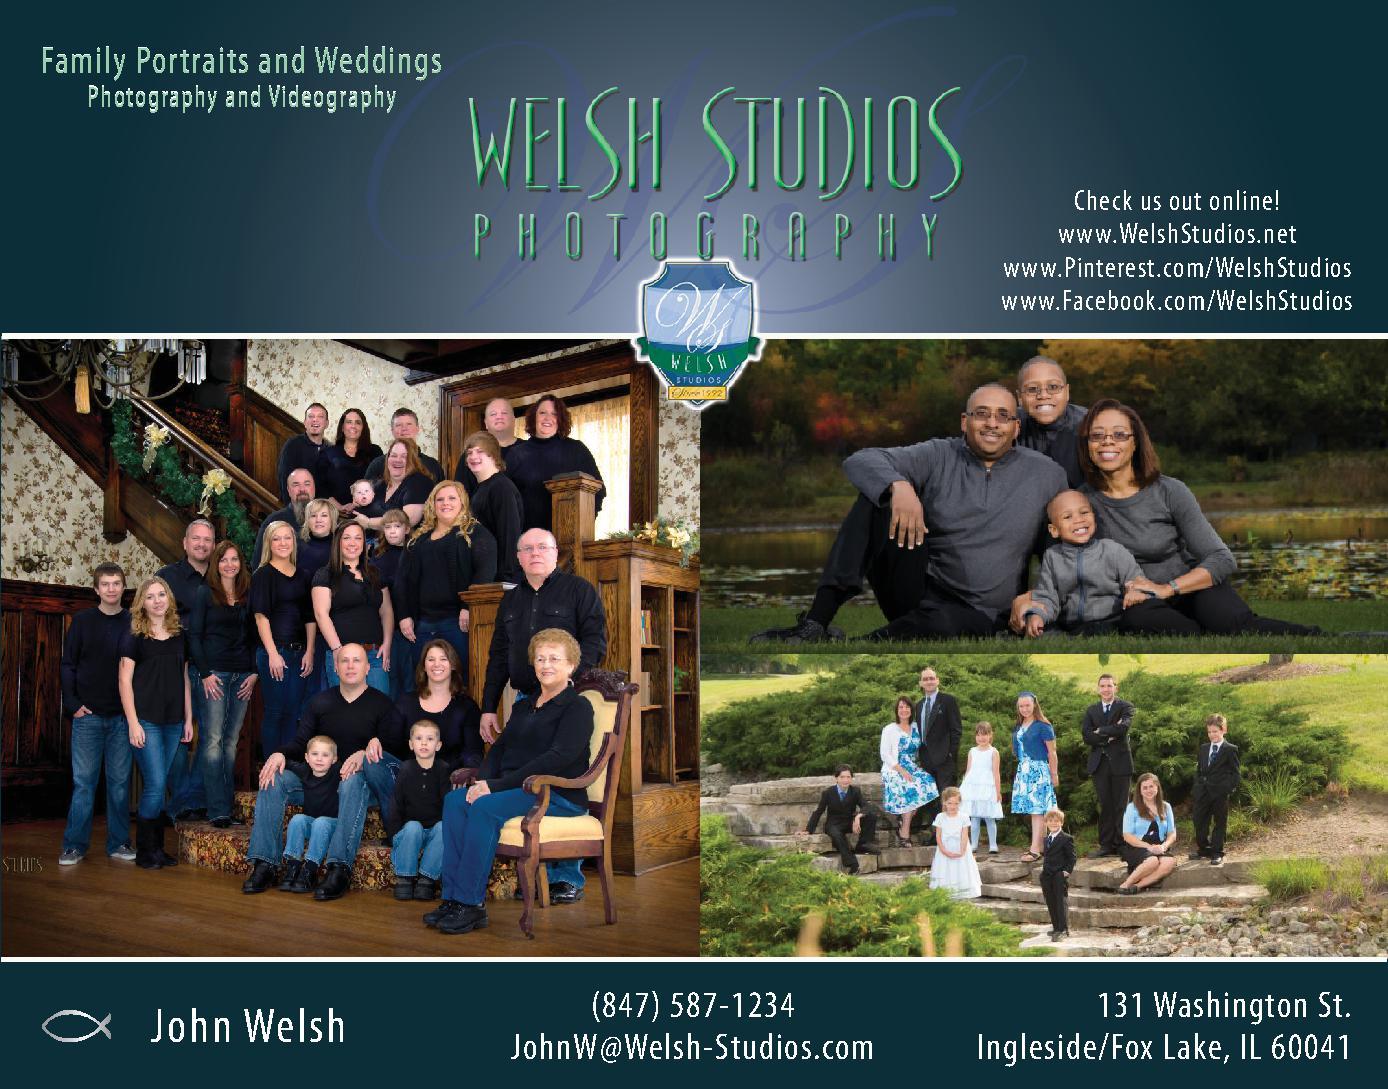 Welsh Studios Photography